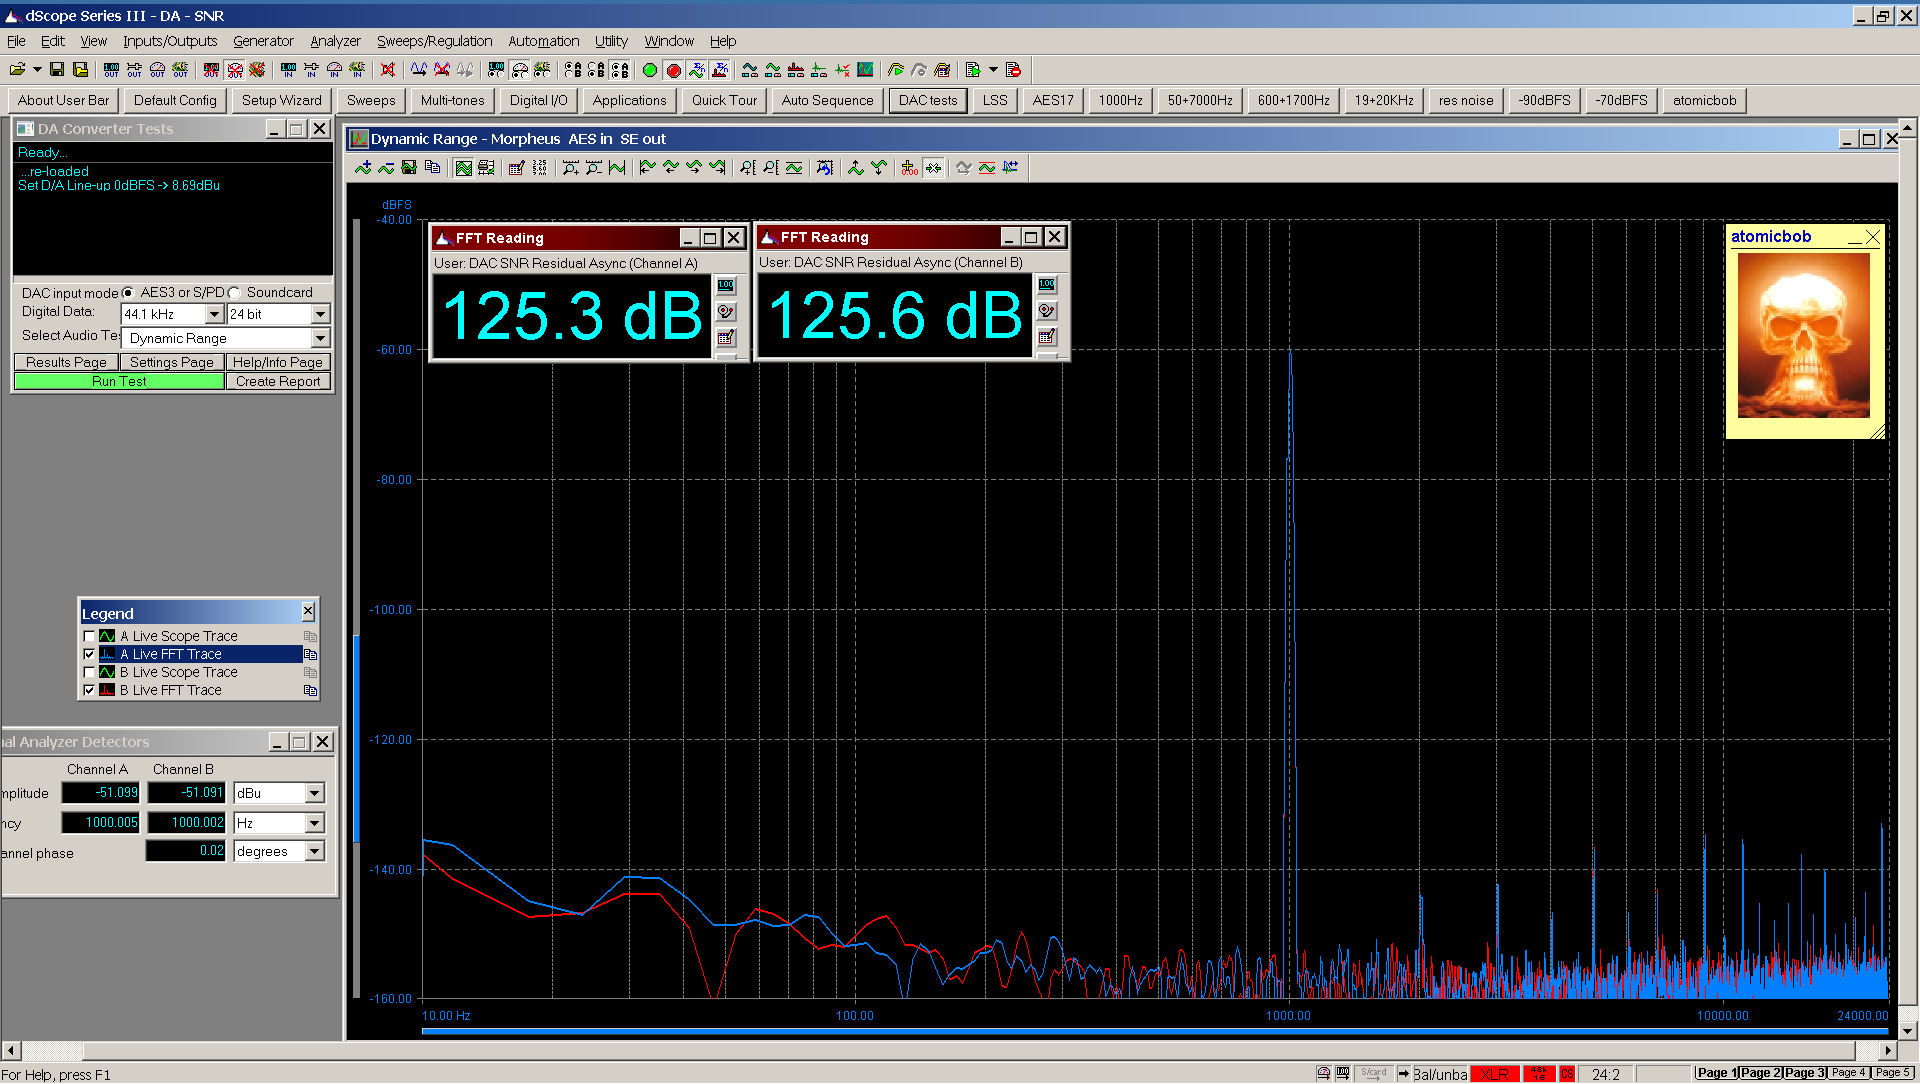 20200717 morpheus dynamic range FFT AES SE t2.png